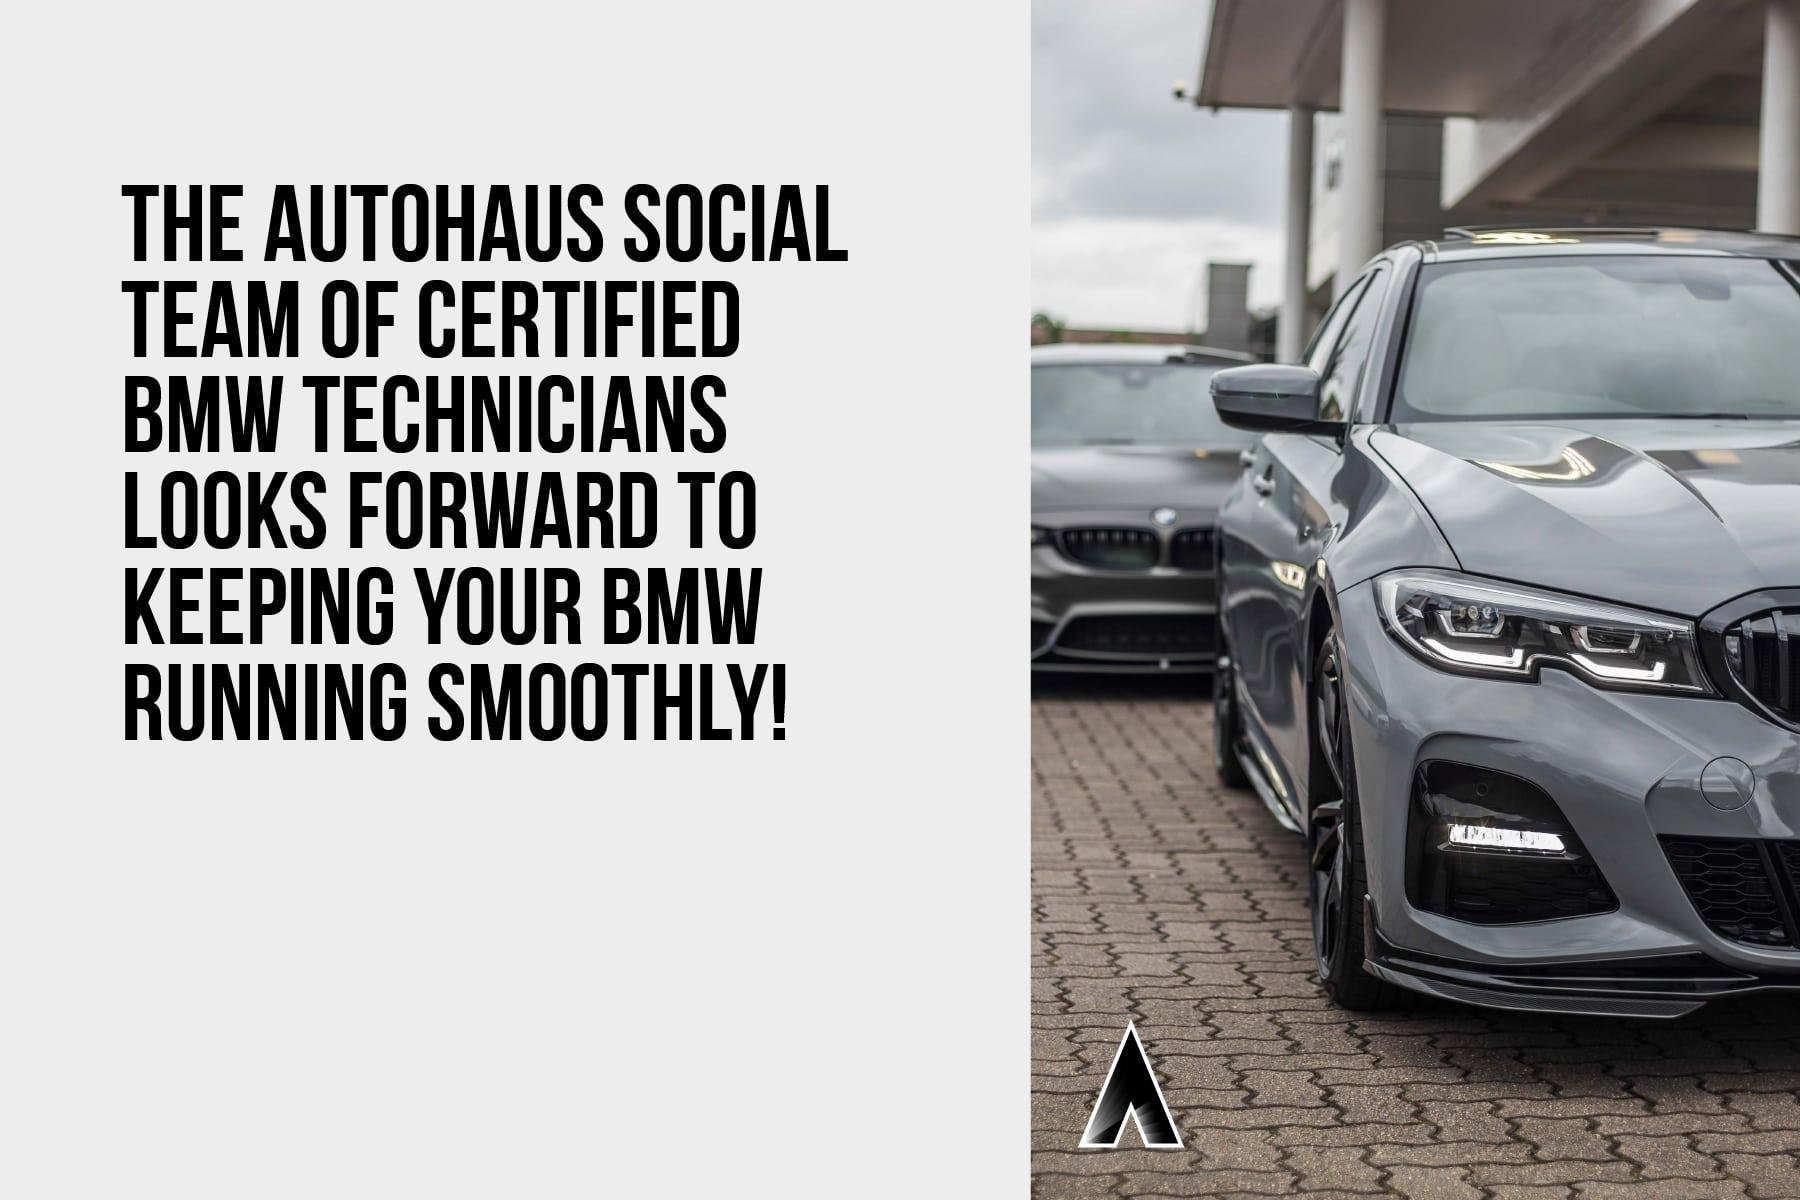 Autohaus Social employes certified BMW technicians